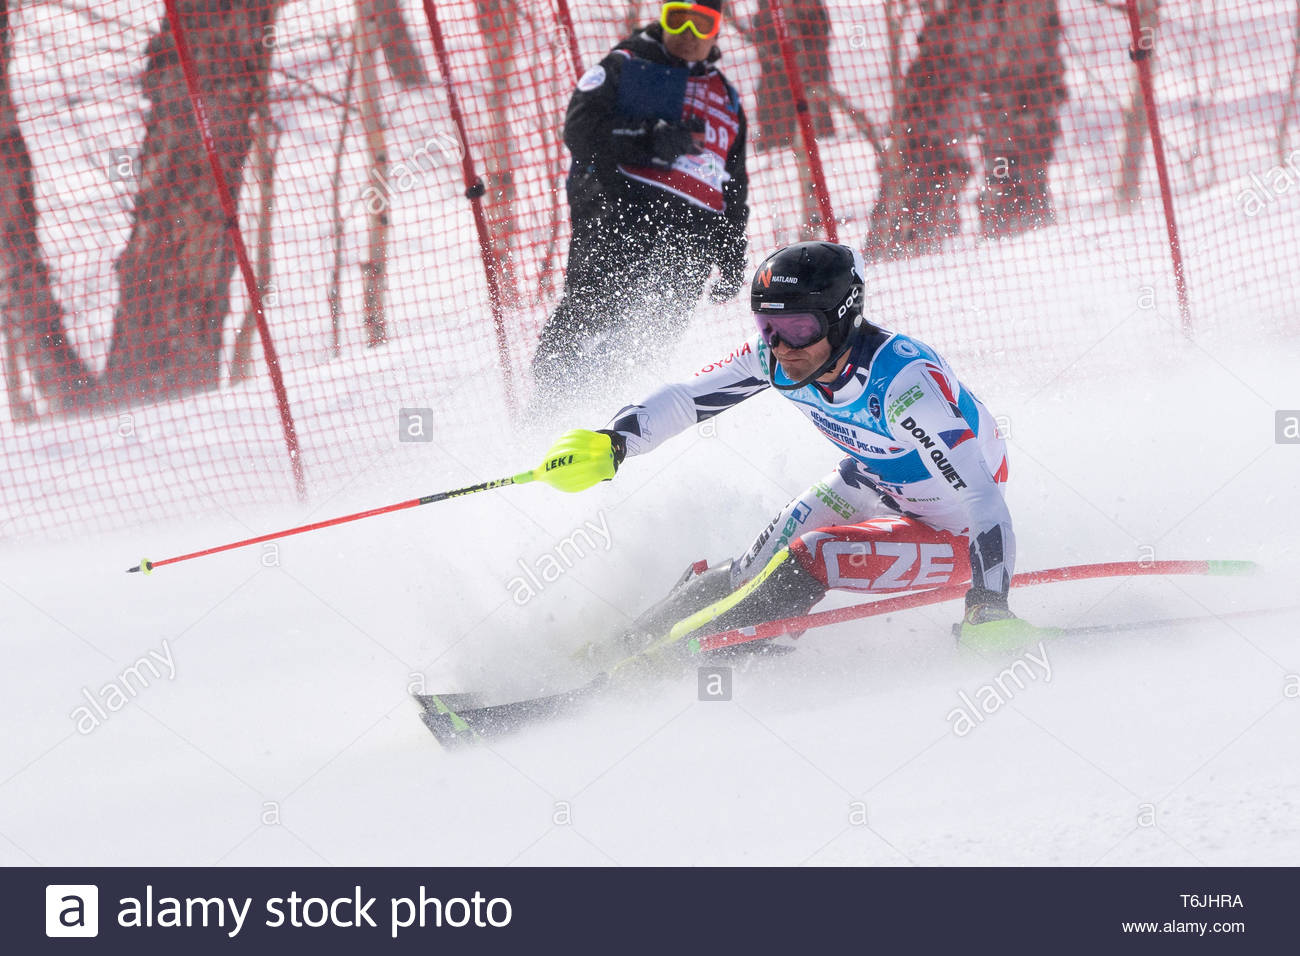 MOROZNAYA MOUNT, KAMCHATKA PENINSULA, RUSSIAN FAR EAST - MARCH 29, 2019: Mountain skier Kryzl Krystof (Czech Republic) skiing down mountain slope. Int - Stock Image